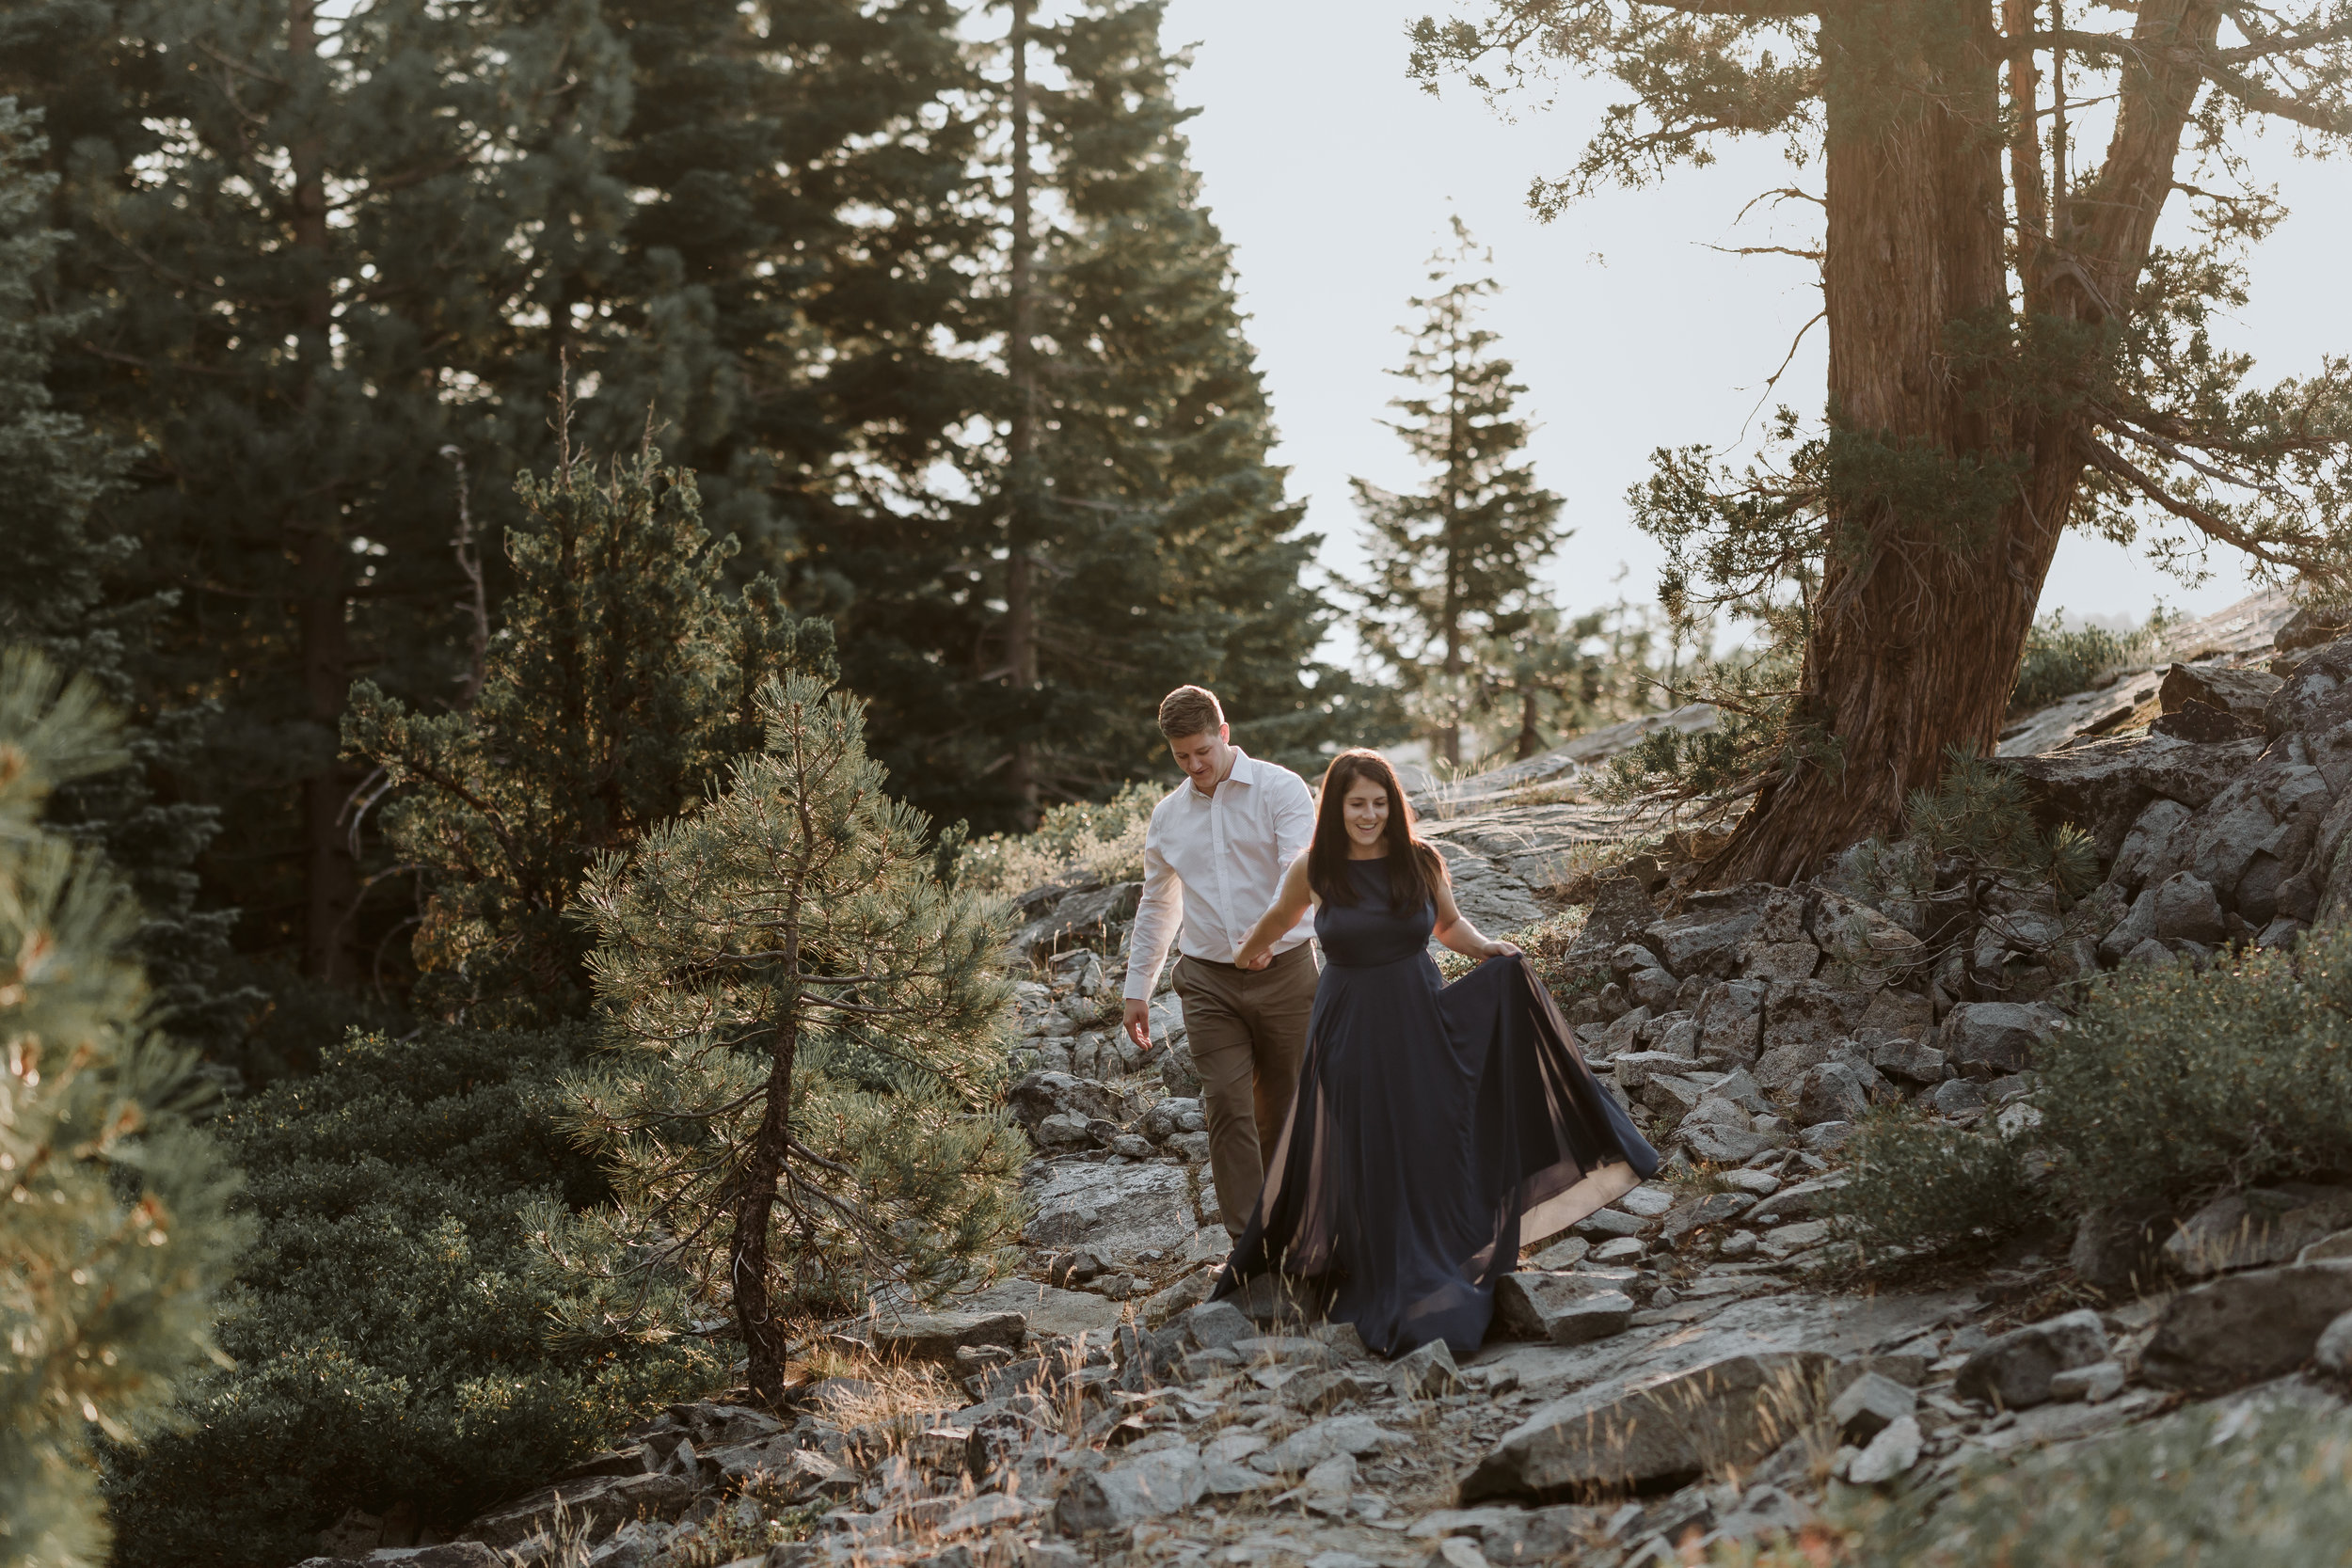 nicole-daacke-photography-lake-tahoe-sunrise-summer-adventure-engagement-photos-nevada-wedding-elopement-photographer-golden-emerald-bay-light-pine-trees-summer-vibe-fun-carefree-authentic-love-36.jpg